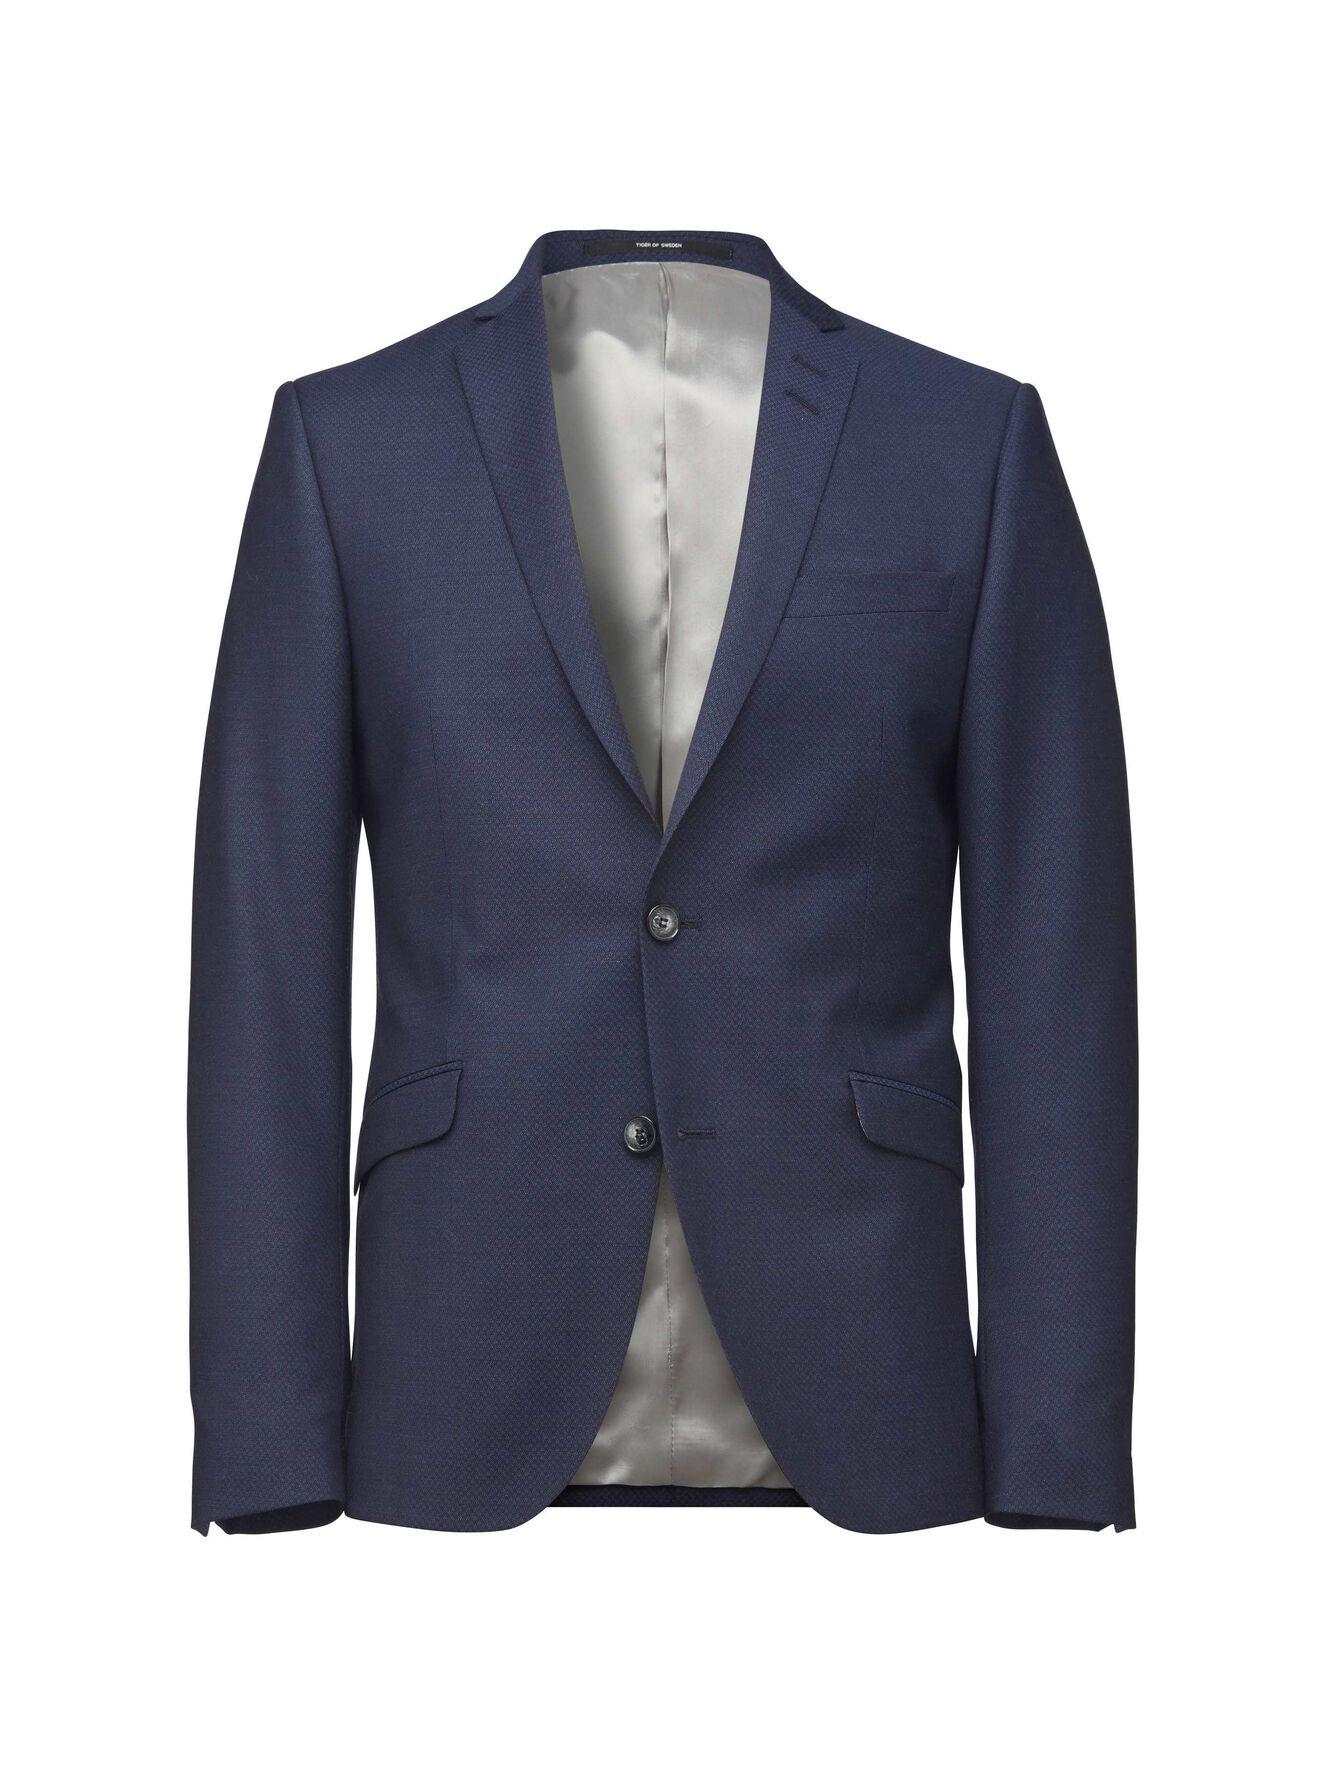 Harrie blazer in Royal Blue from Tiger of Sweden